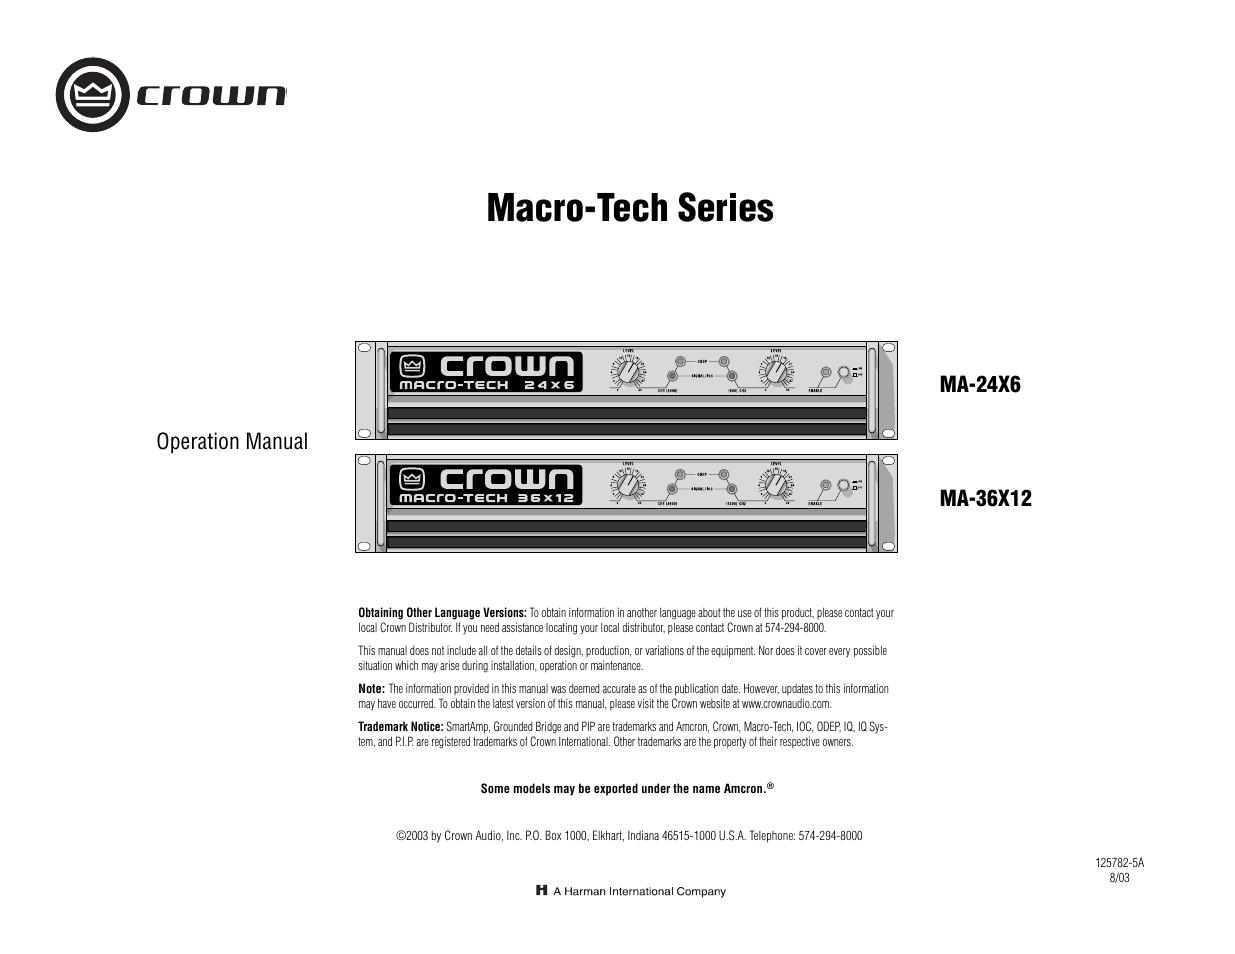 Crown Audio Macro-Tech Series (24x6 & 36x12) User Manual